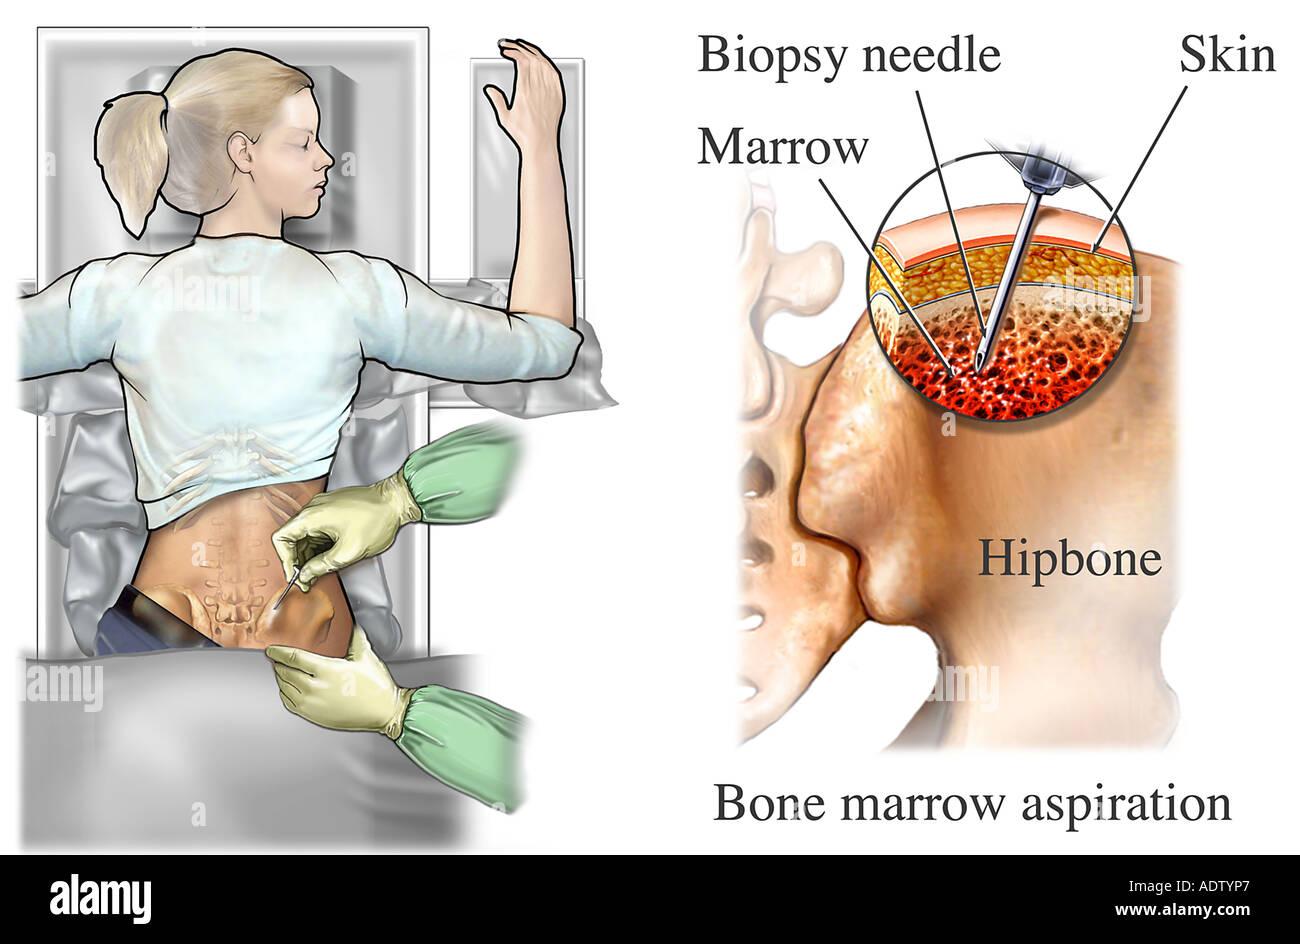 Bone Marrow Aspiration - Stock Image